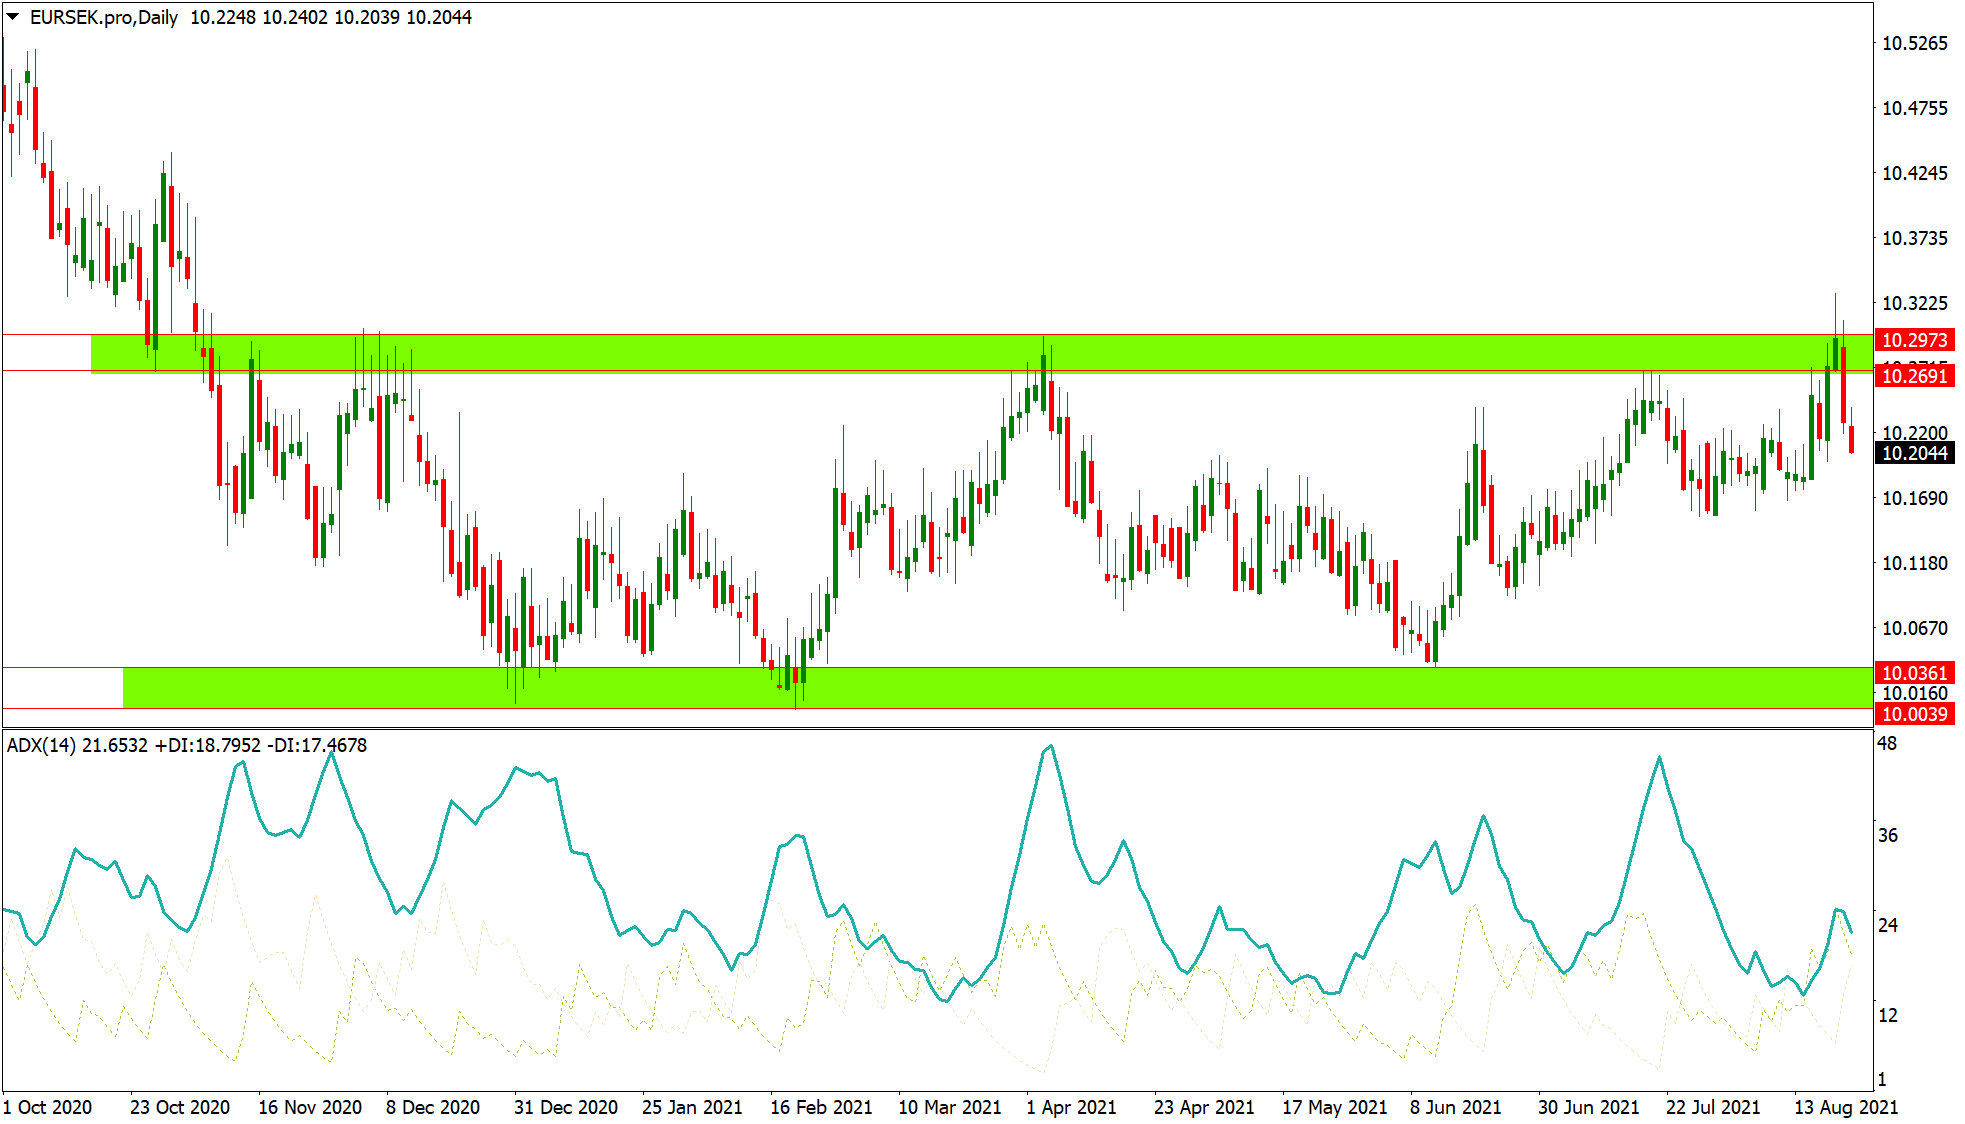 EURSEK chart with range trading strategy